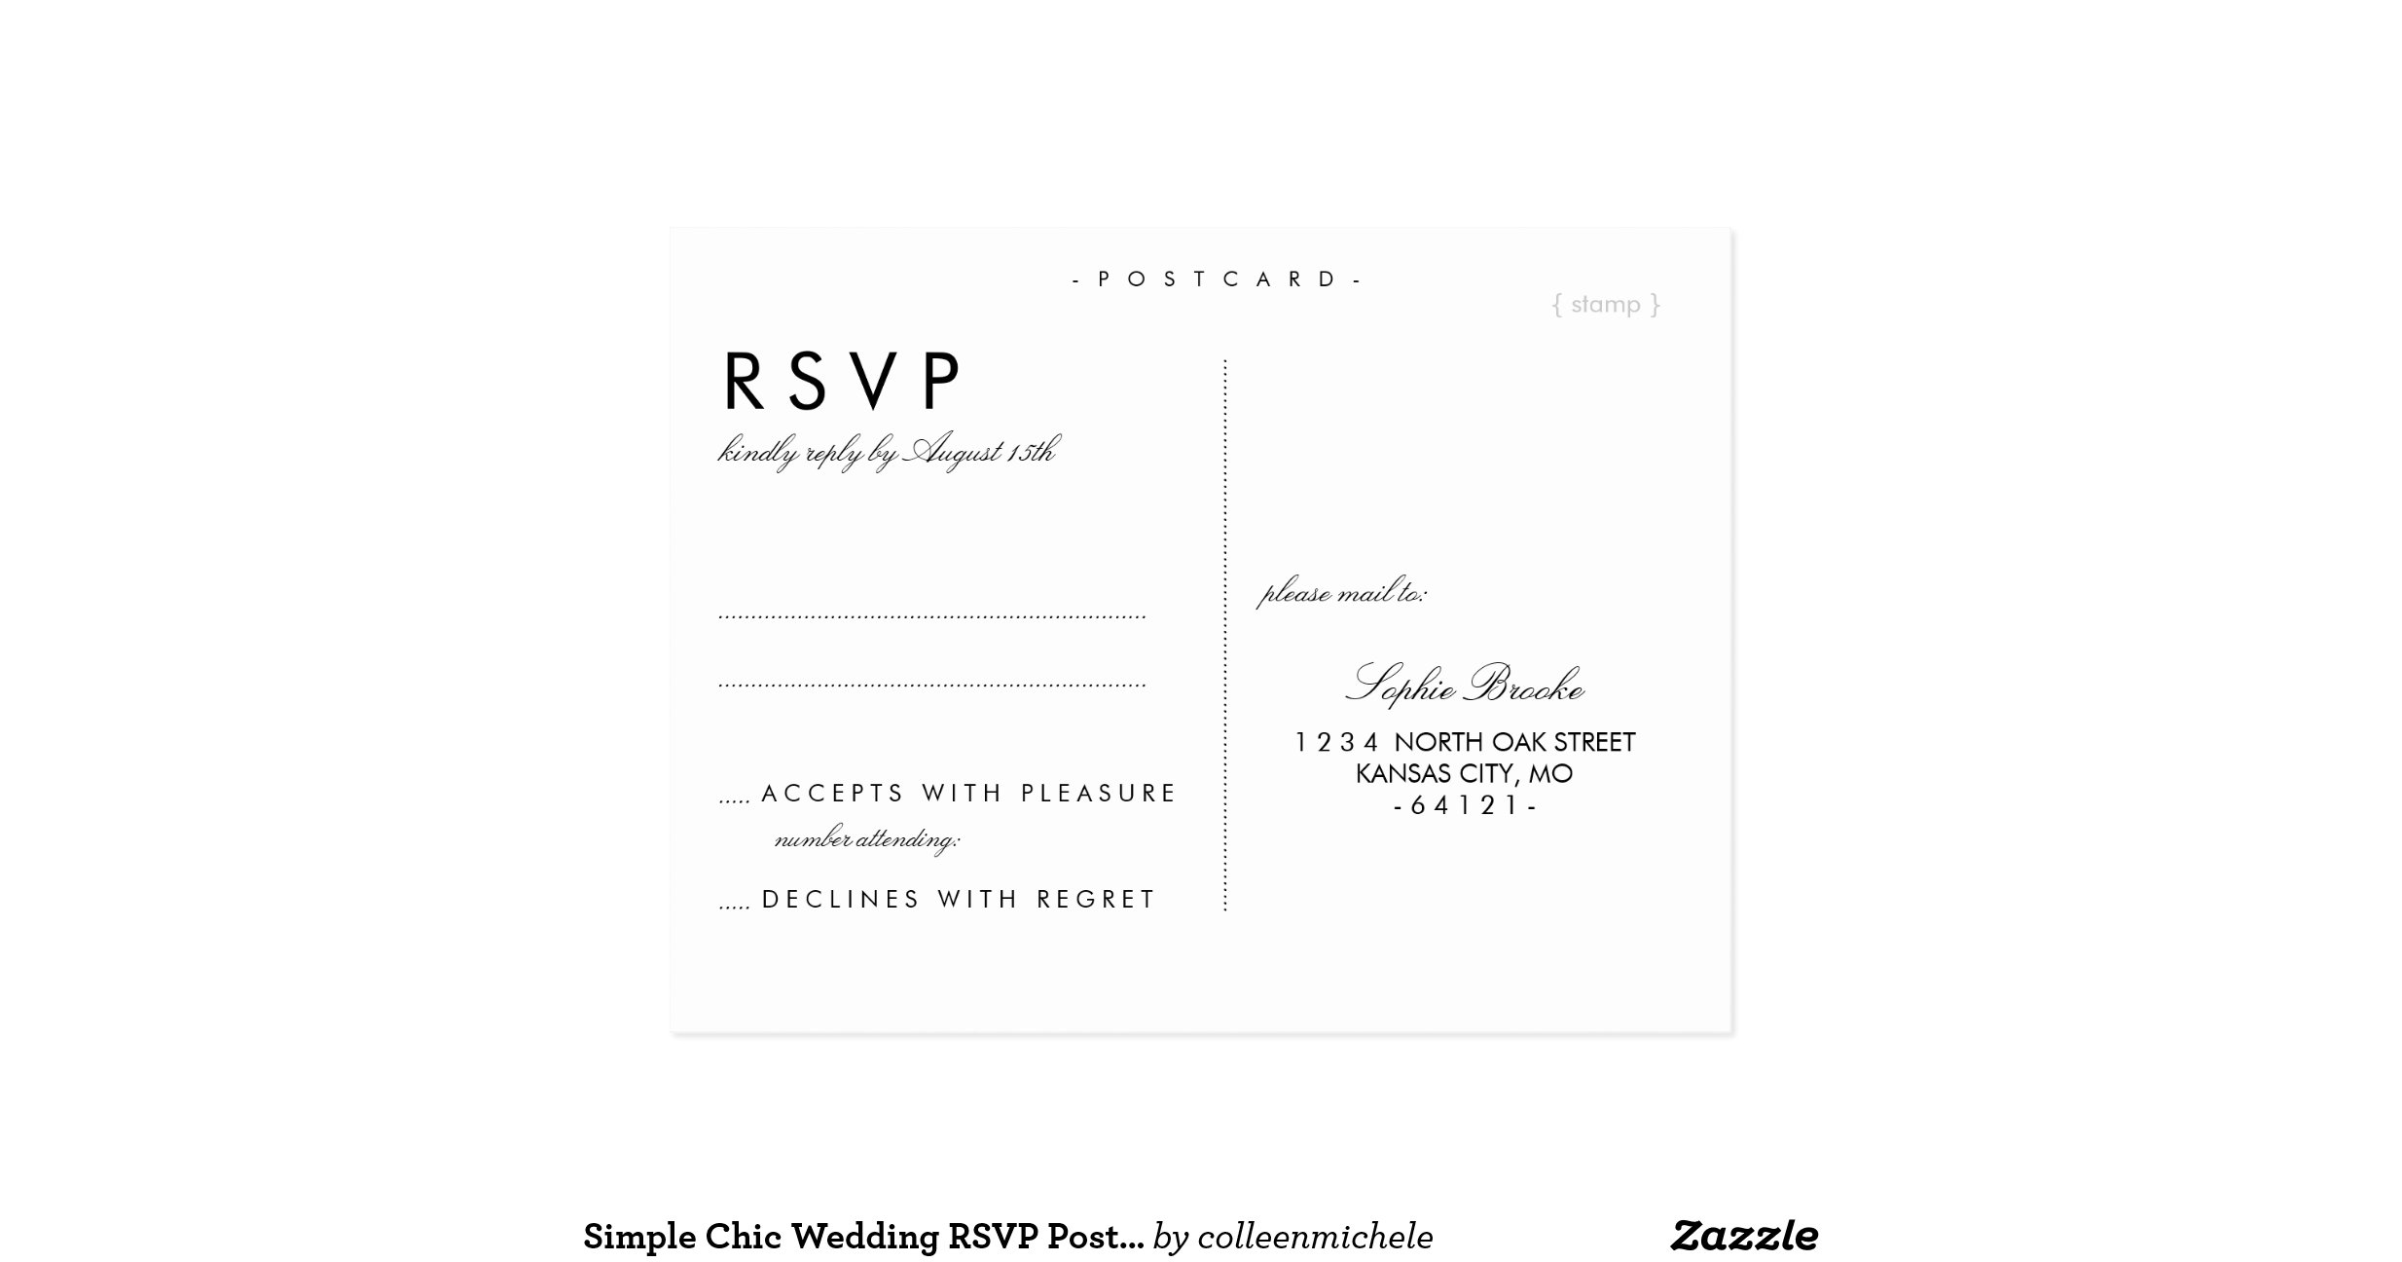 simple chic wedding rsvp postcard template